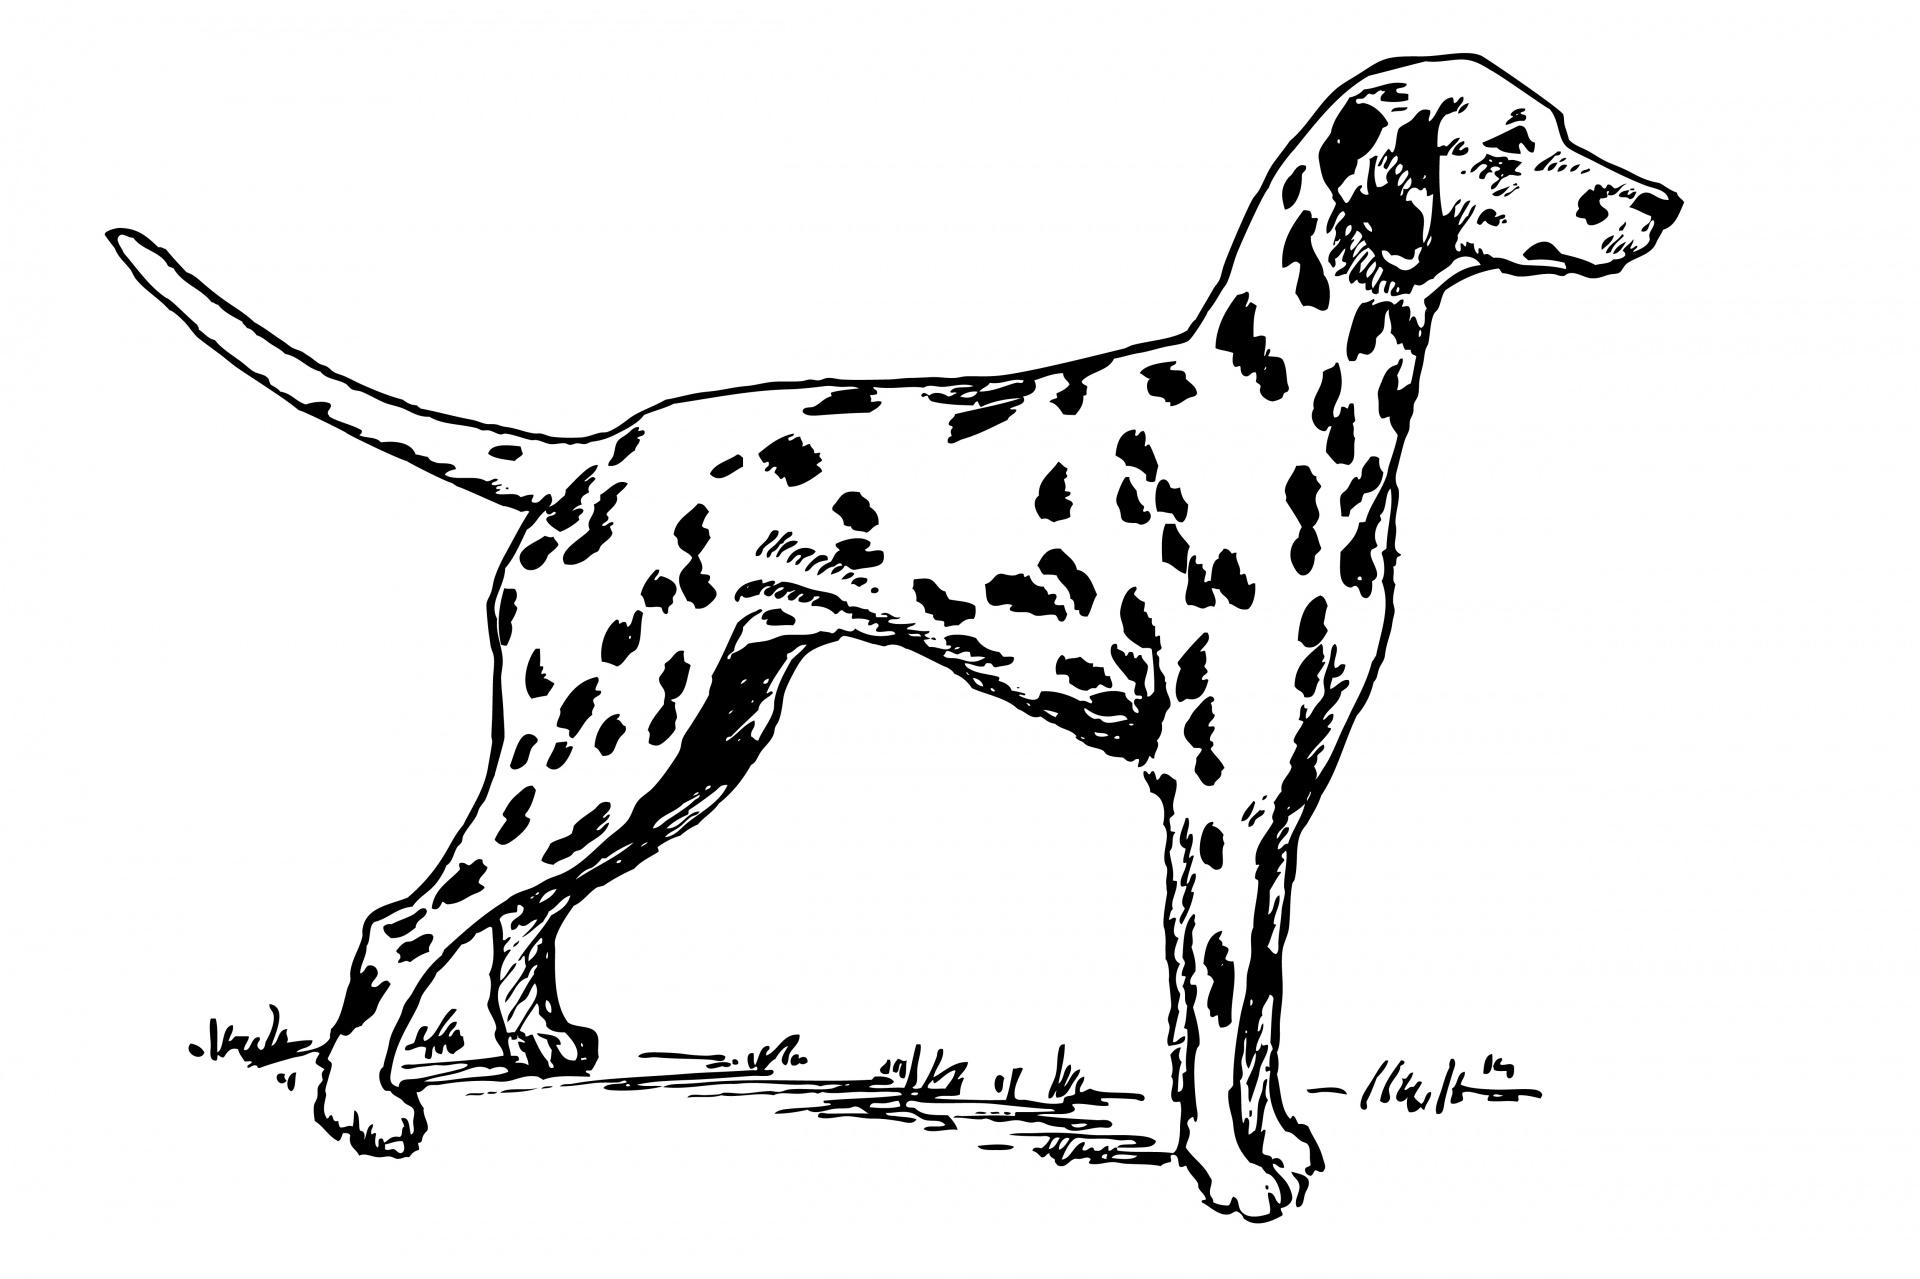 Dalmatian clipart. Dog free stock photo